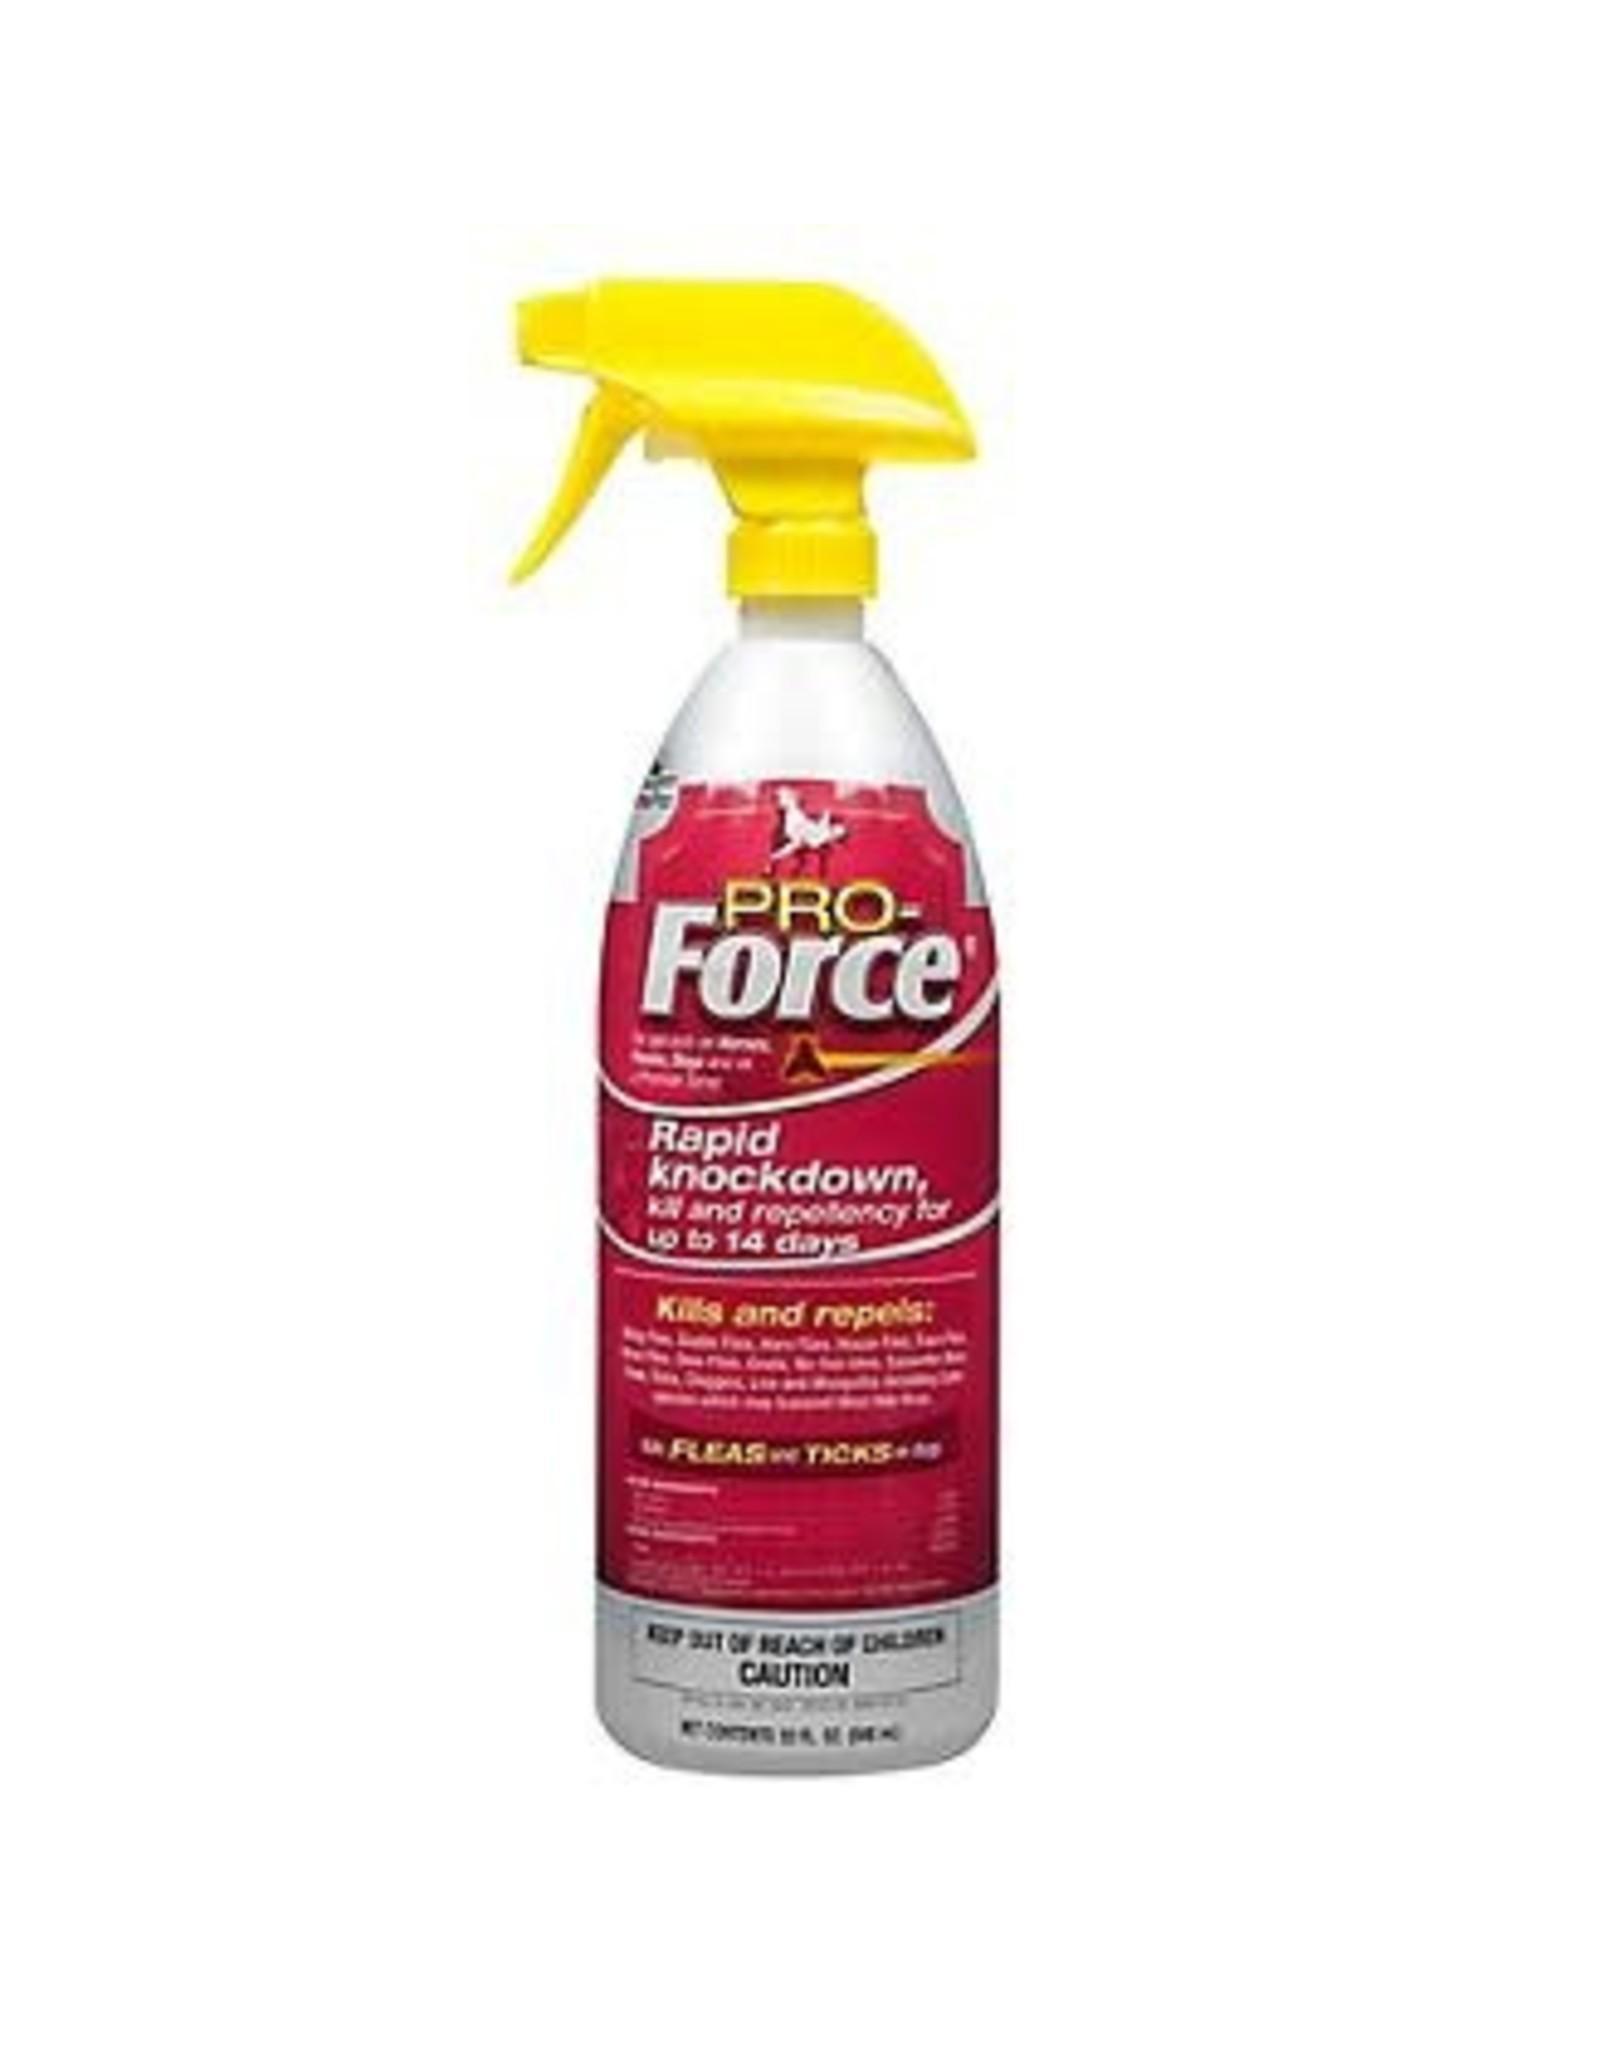 Manna Pro Fly Spray Pro Force Rapid Knockdown